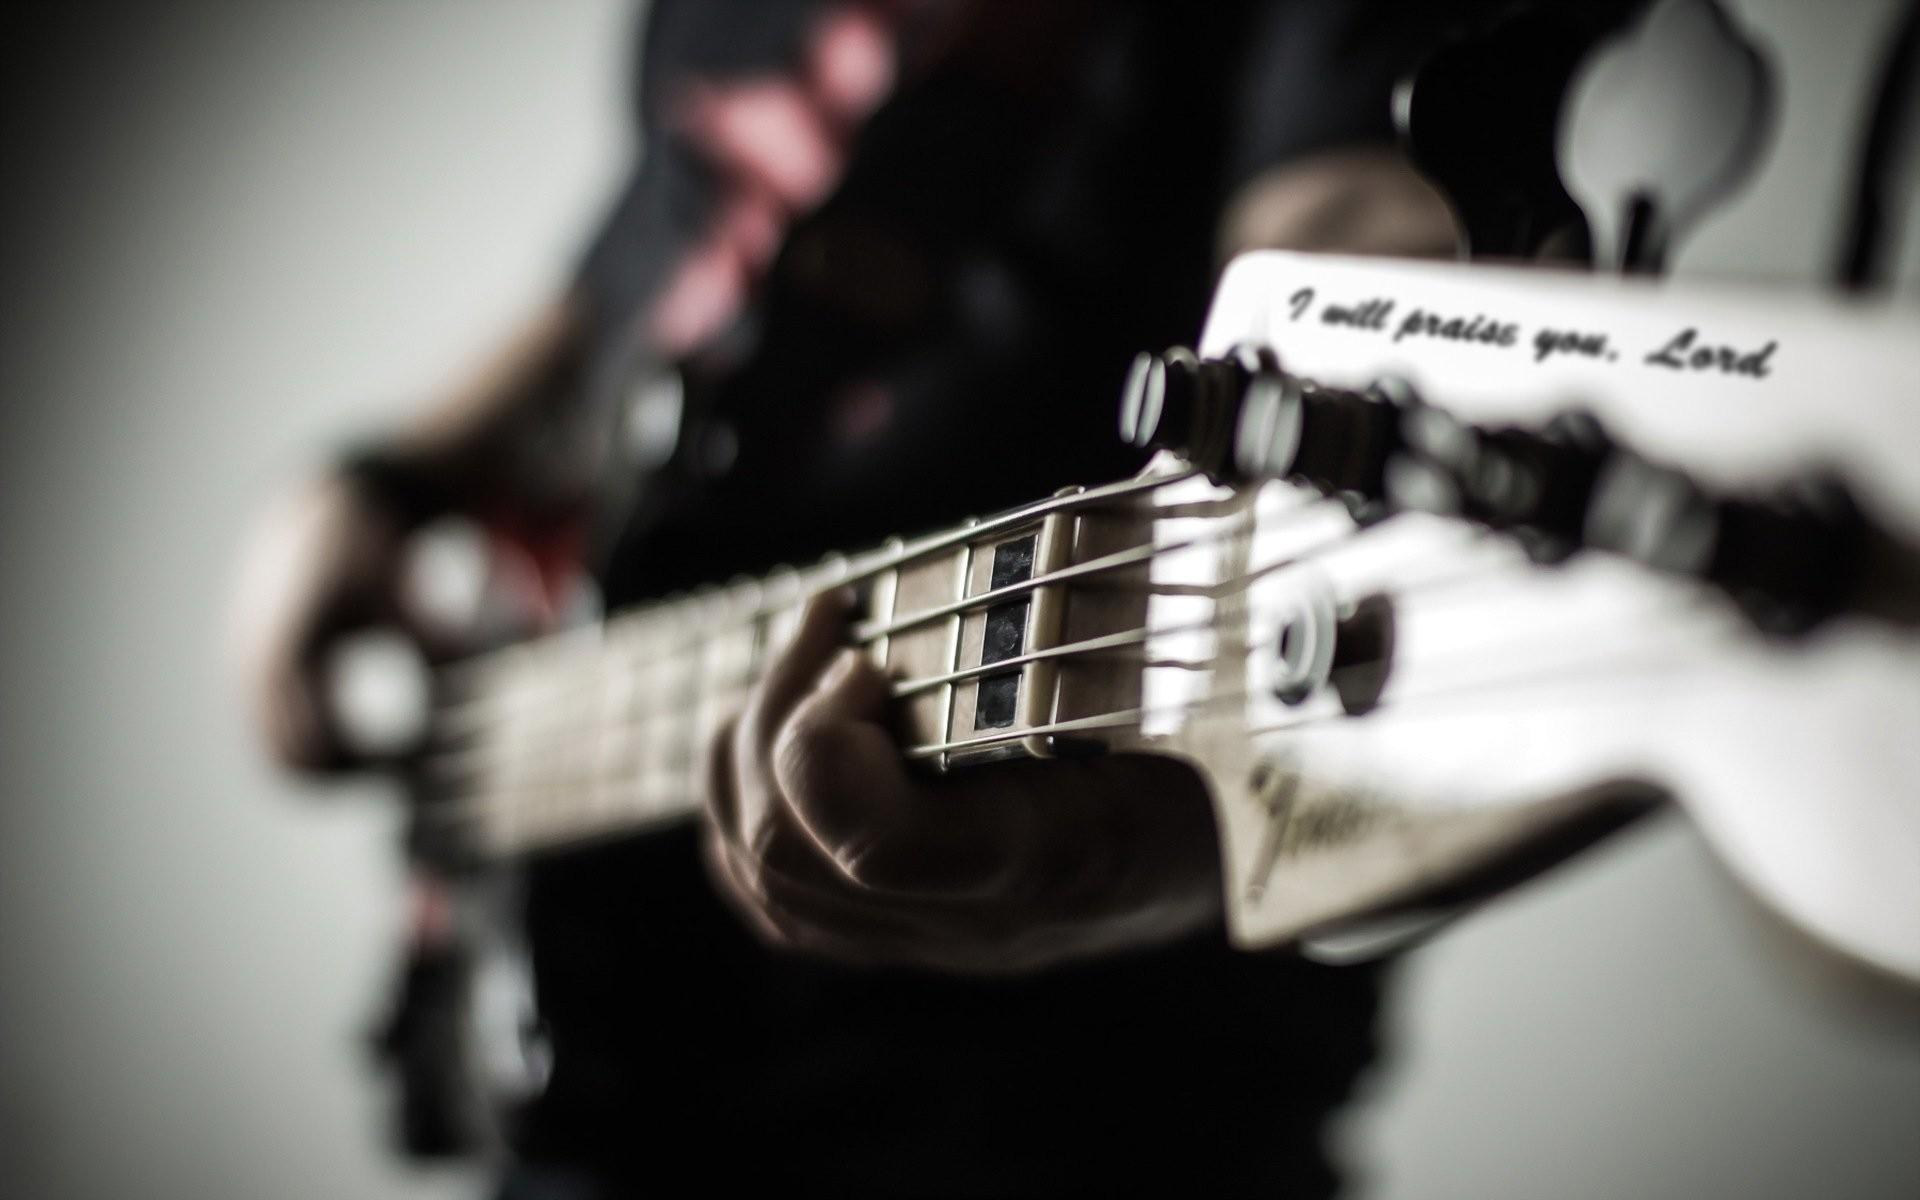 bass guitar iphone wallpaper 64 images